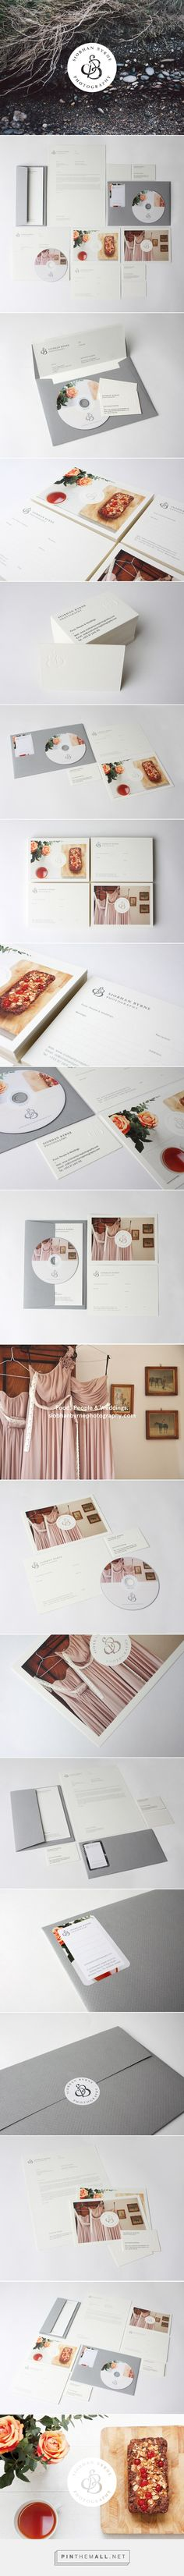 6fd77a8d96c6 Siobhan Byrne Photography Branding on Behance